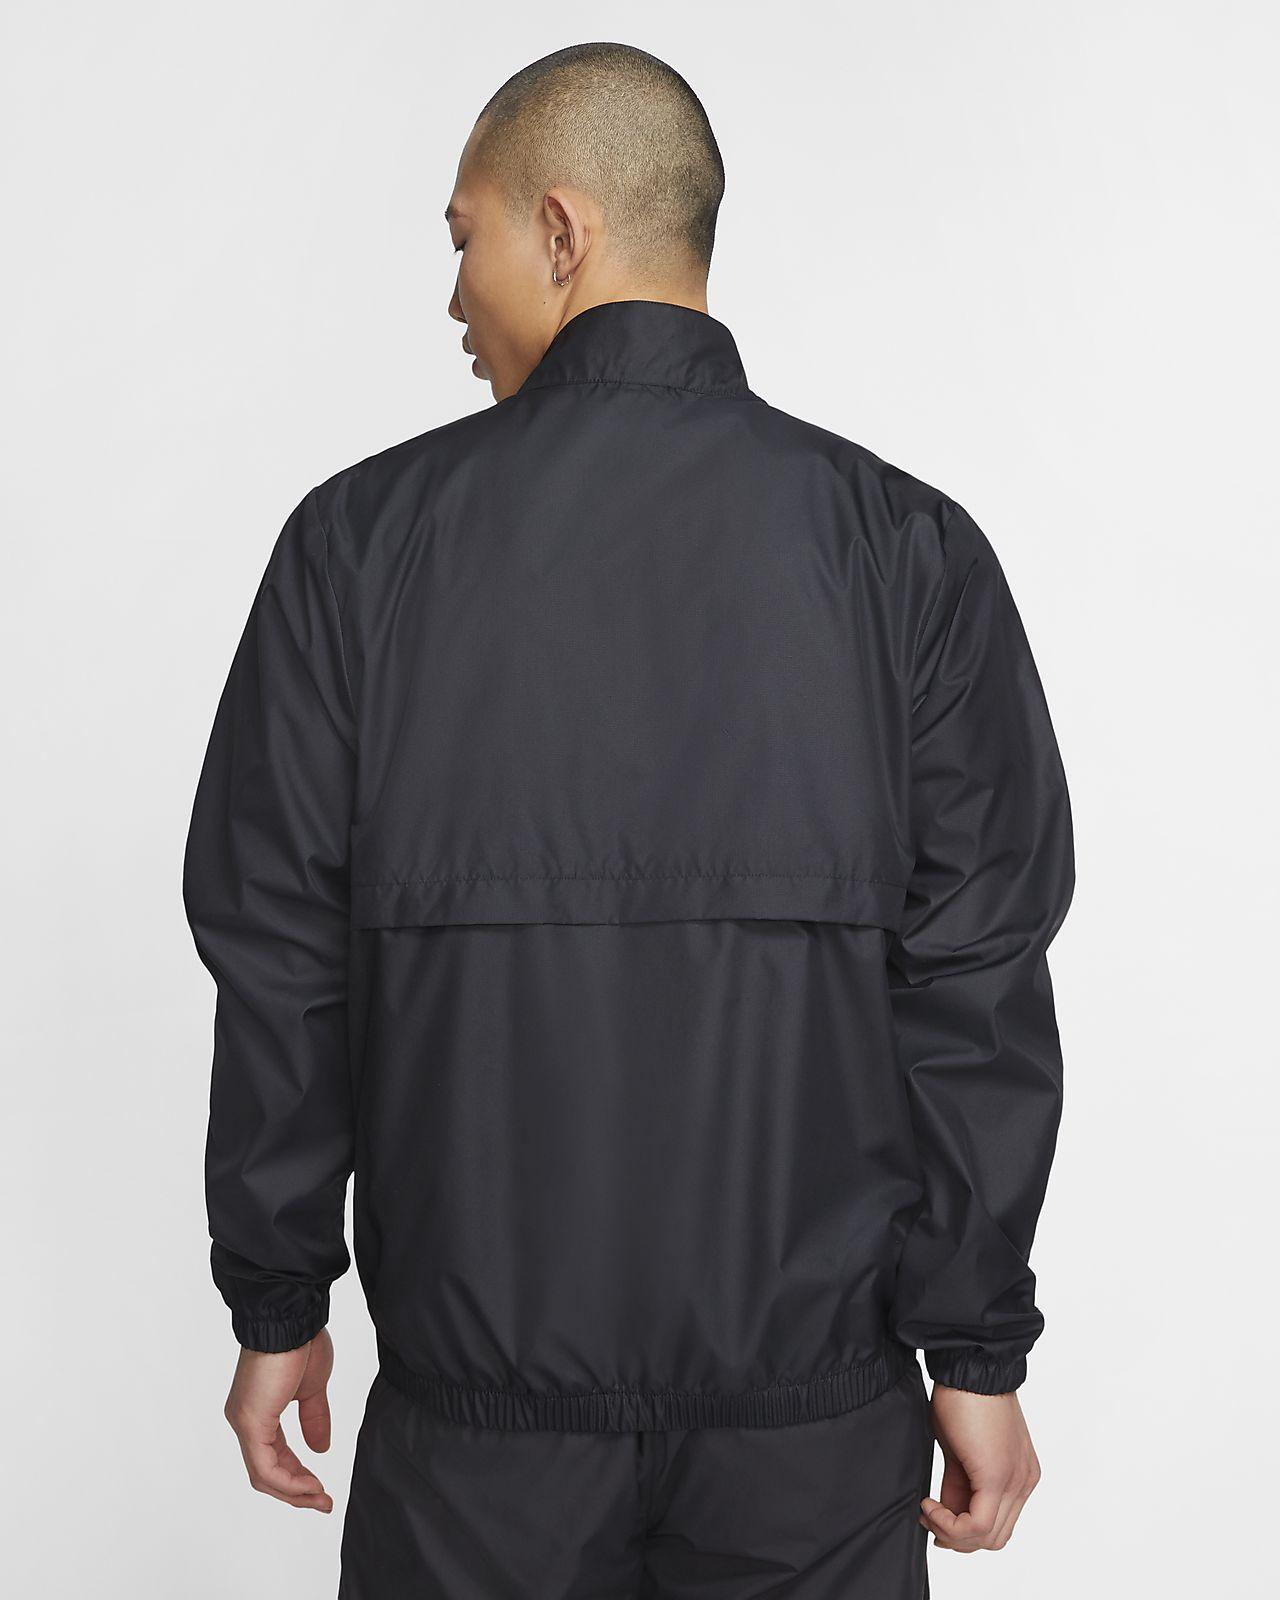 Nike SB Men's Skate Jacket